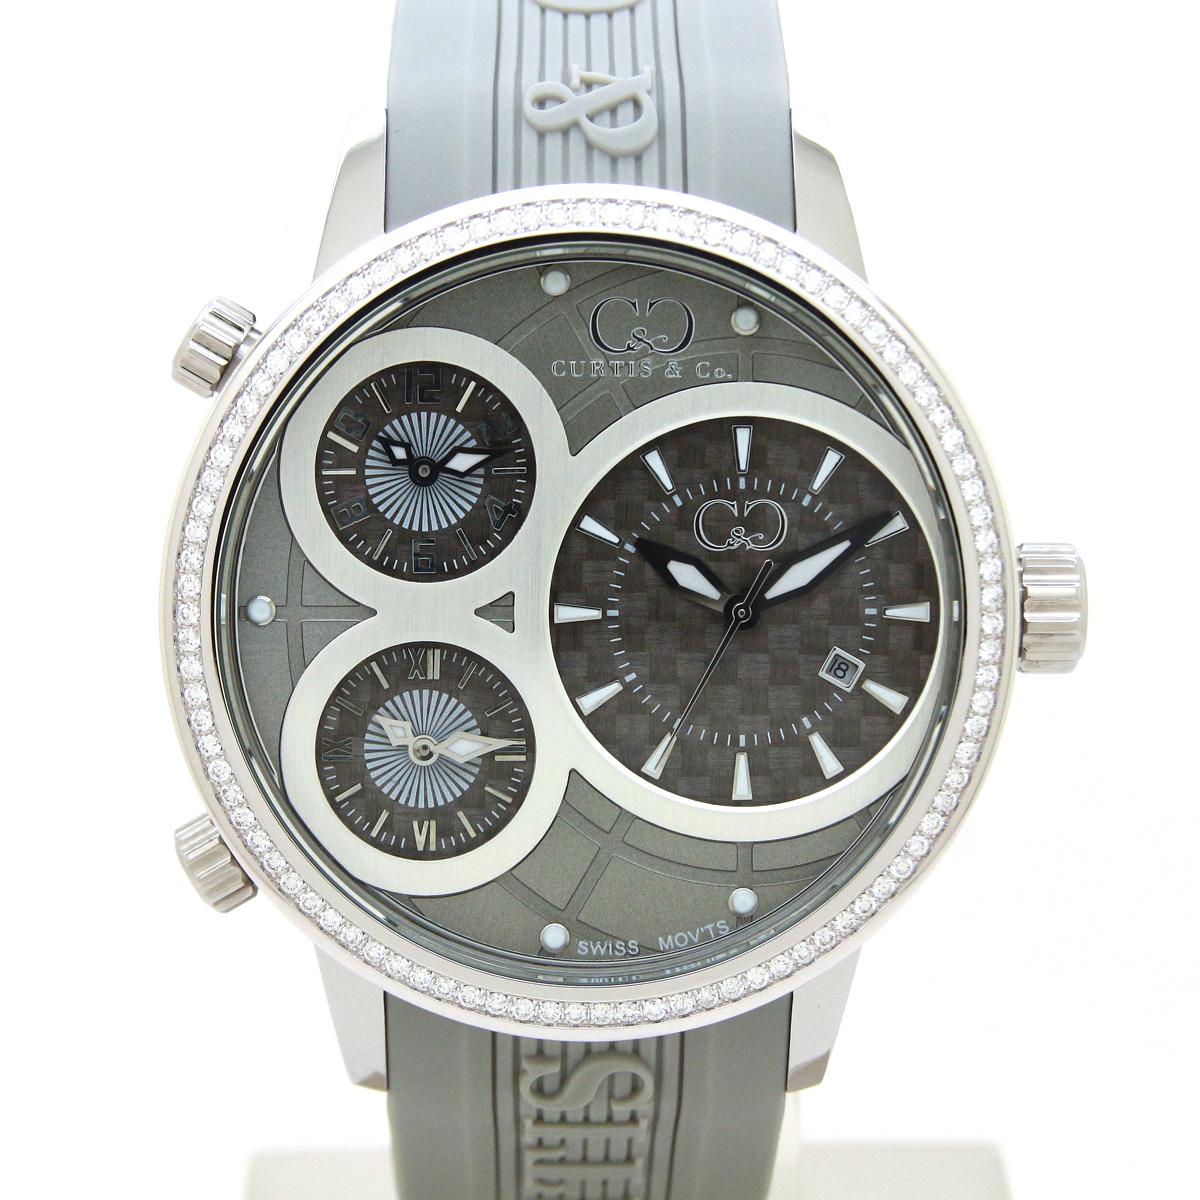 CURTIS&Co(カーティス)BIG TIME WORLD 50mm(Gray) カーティス ビックタイムワールド50mm ダイヤモンド【腕時計】